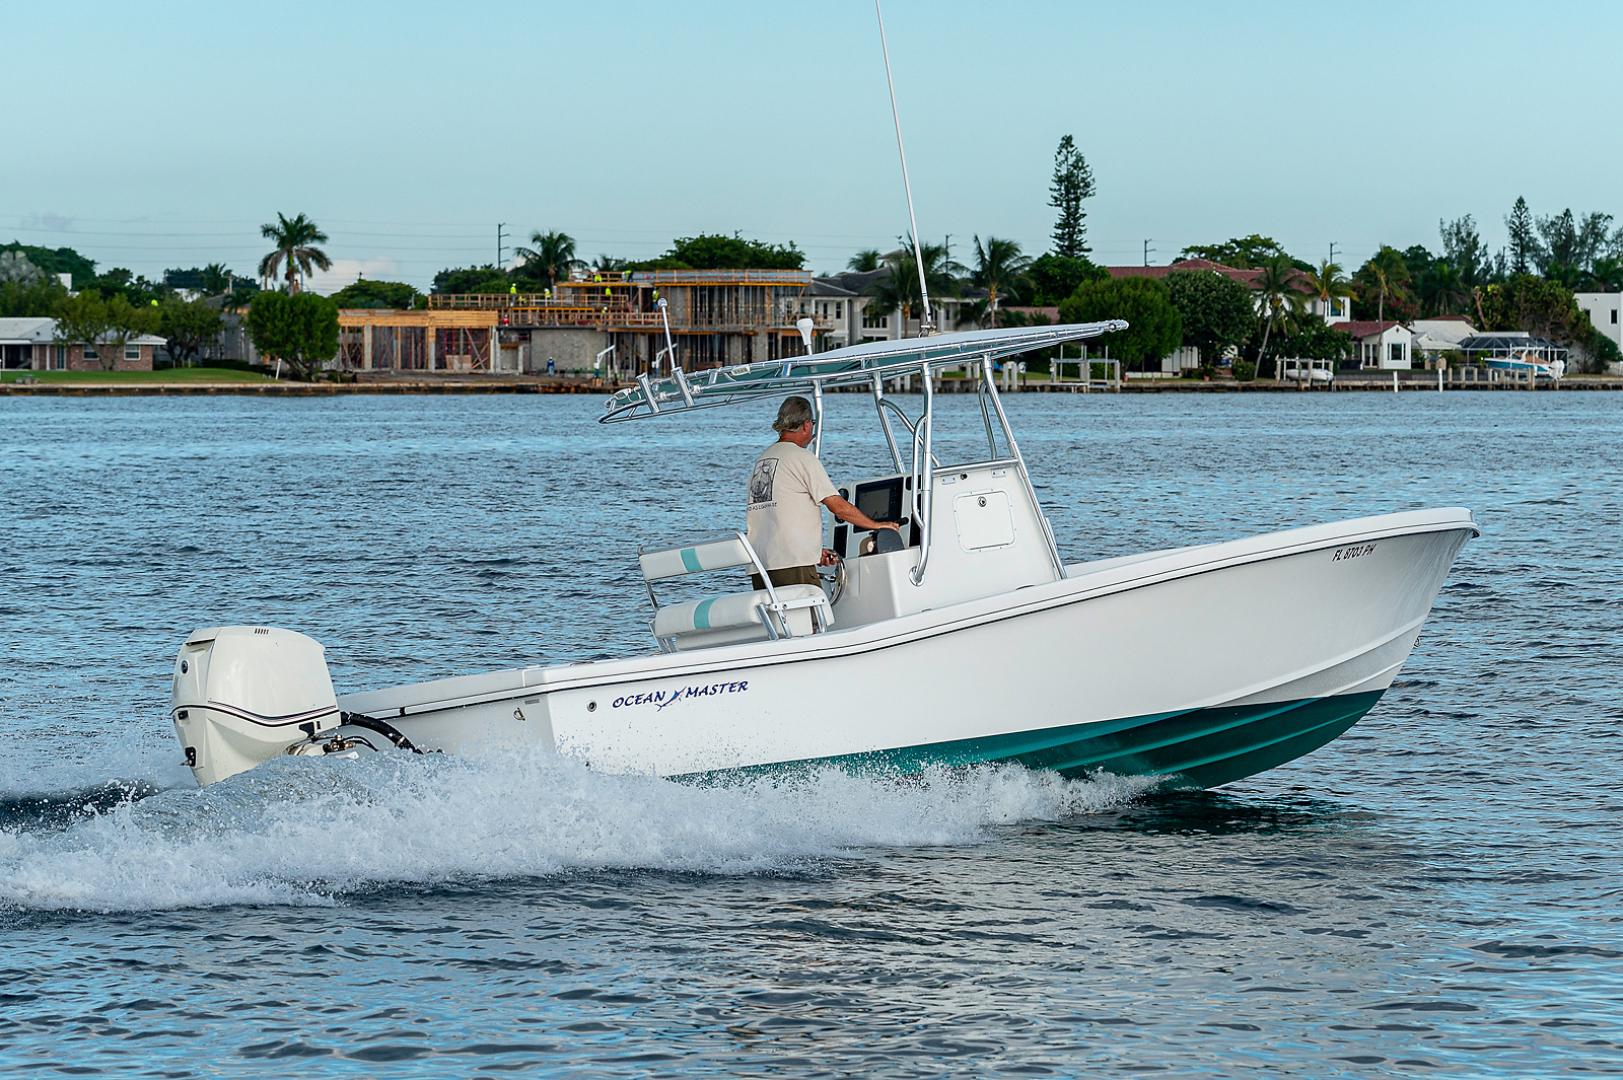 Ocean Master 2013-27 Ocean Master Palm Beach-Florida-United States-27 Ocean Master-1501381 | Thumbnail